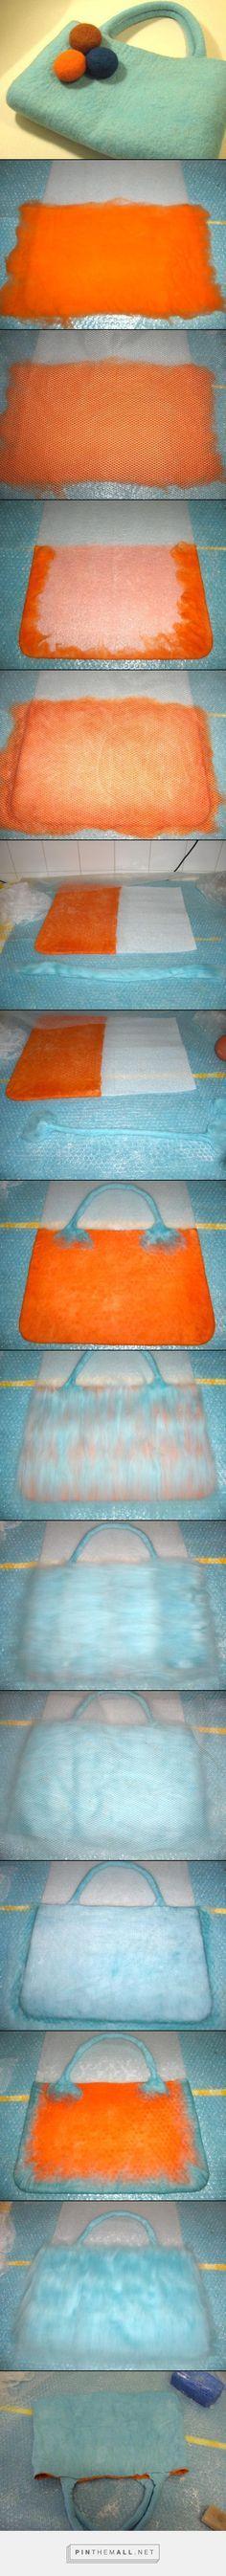 How to wet felt a seamless bag with handles in two colors – workshop by Vanda F. Sousa from Going the Dodo Way. Felt Diy, Handmade Felt, Felt Crafts, Wet Felting Projects, Felting Tutorials, Needle Felted, Nuno Felting, Felt Purse, Felt Bags